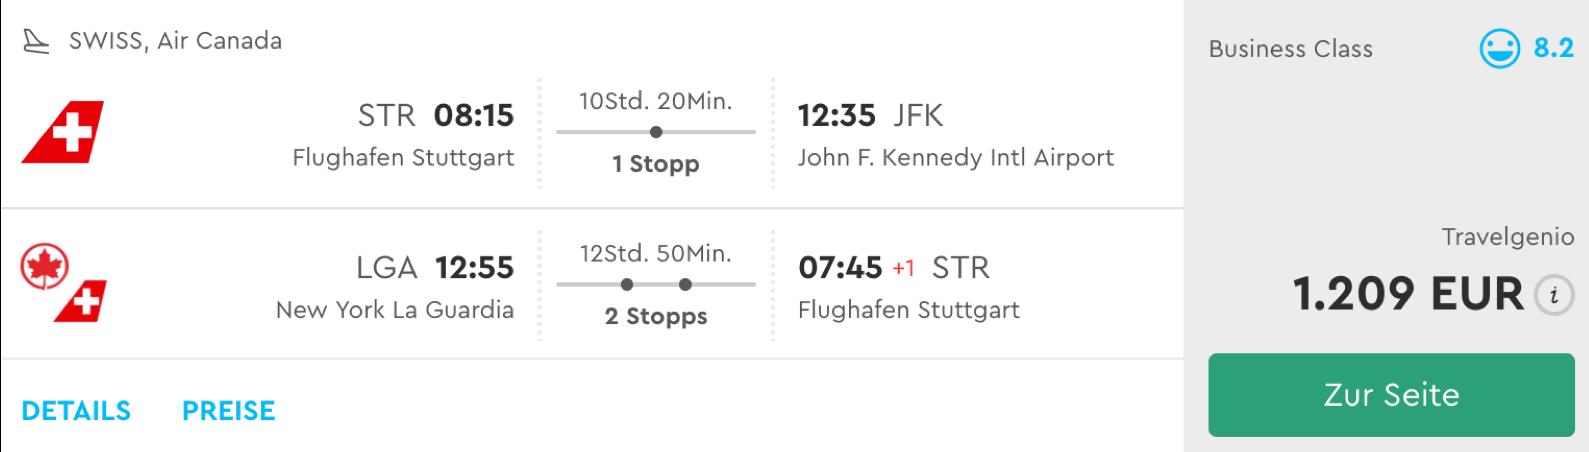 Günstige Business Class FLüge nach New York